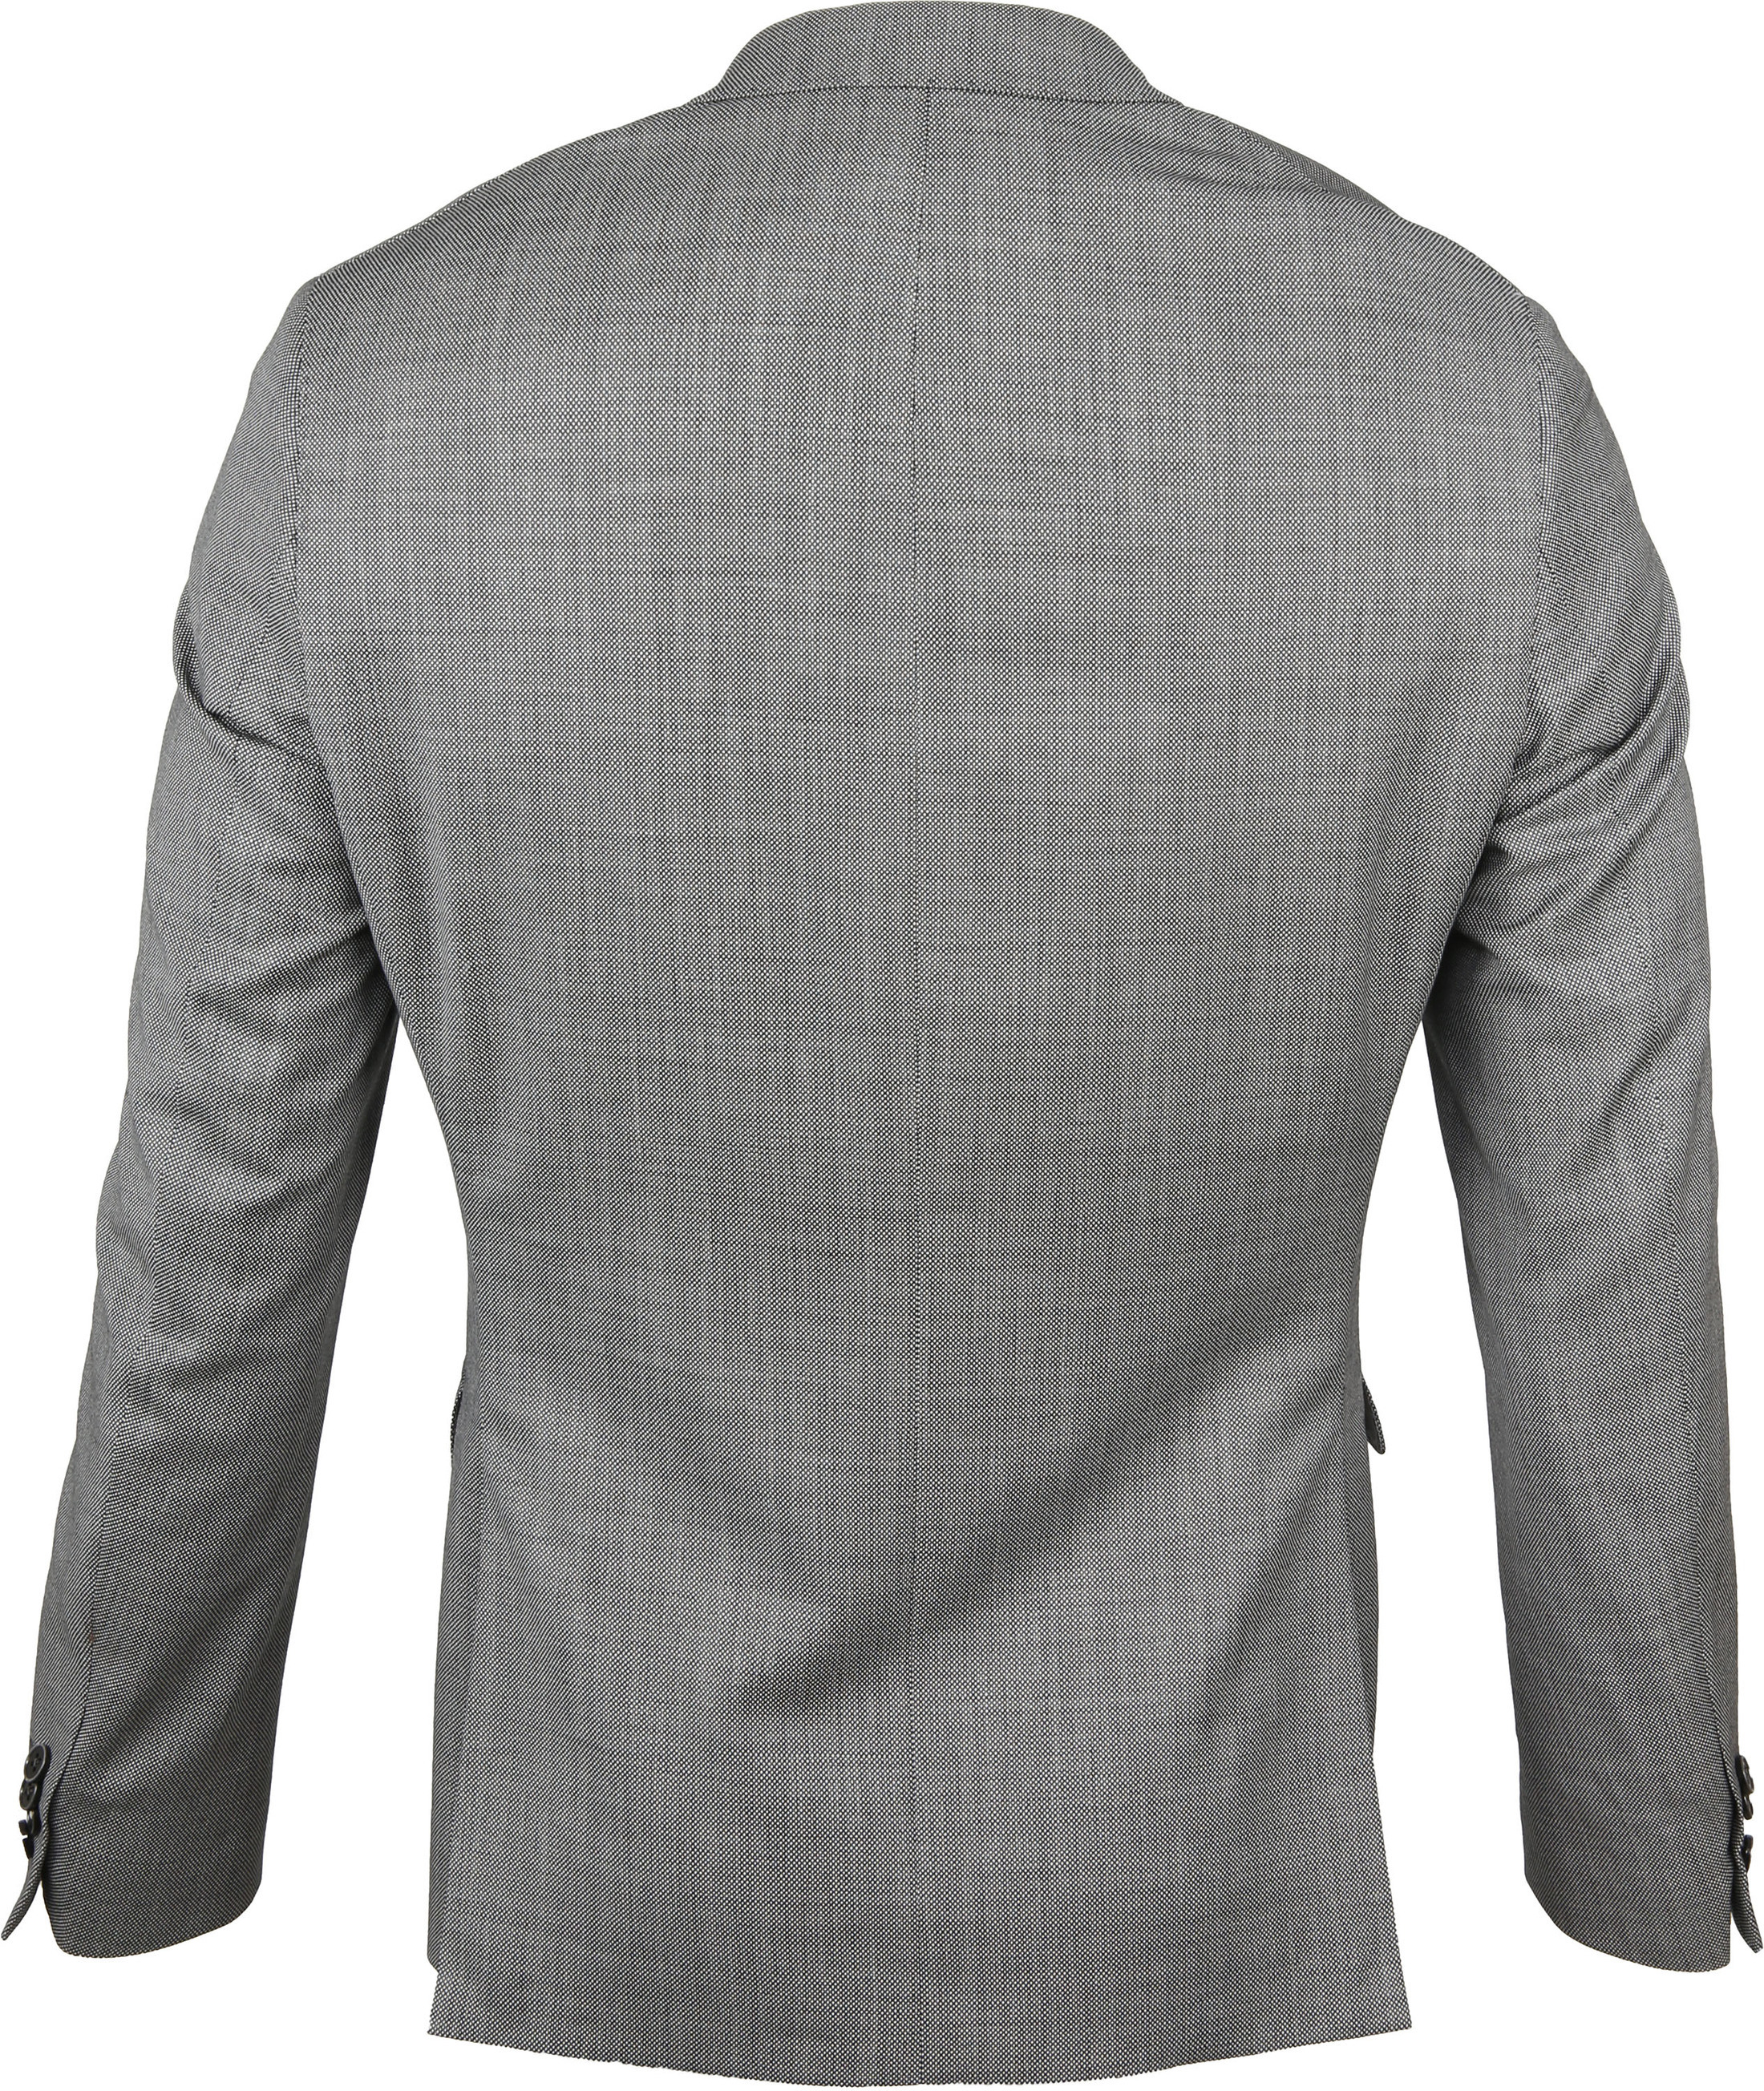 Suitable Kostuum Strato Birdseye Grey